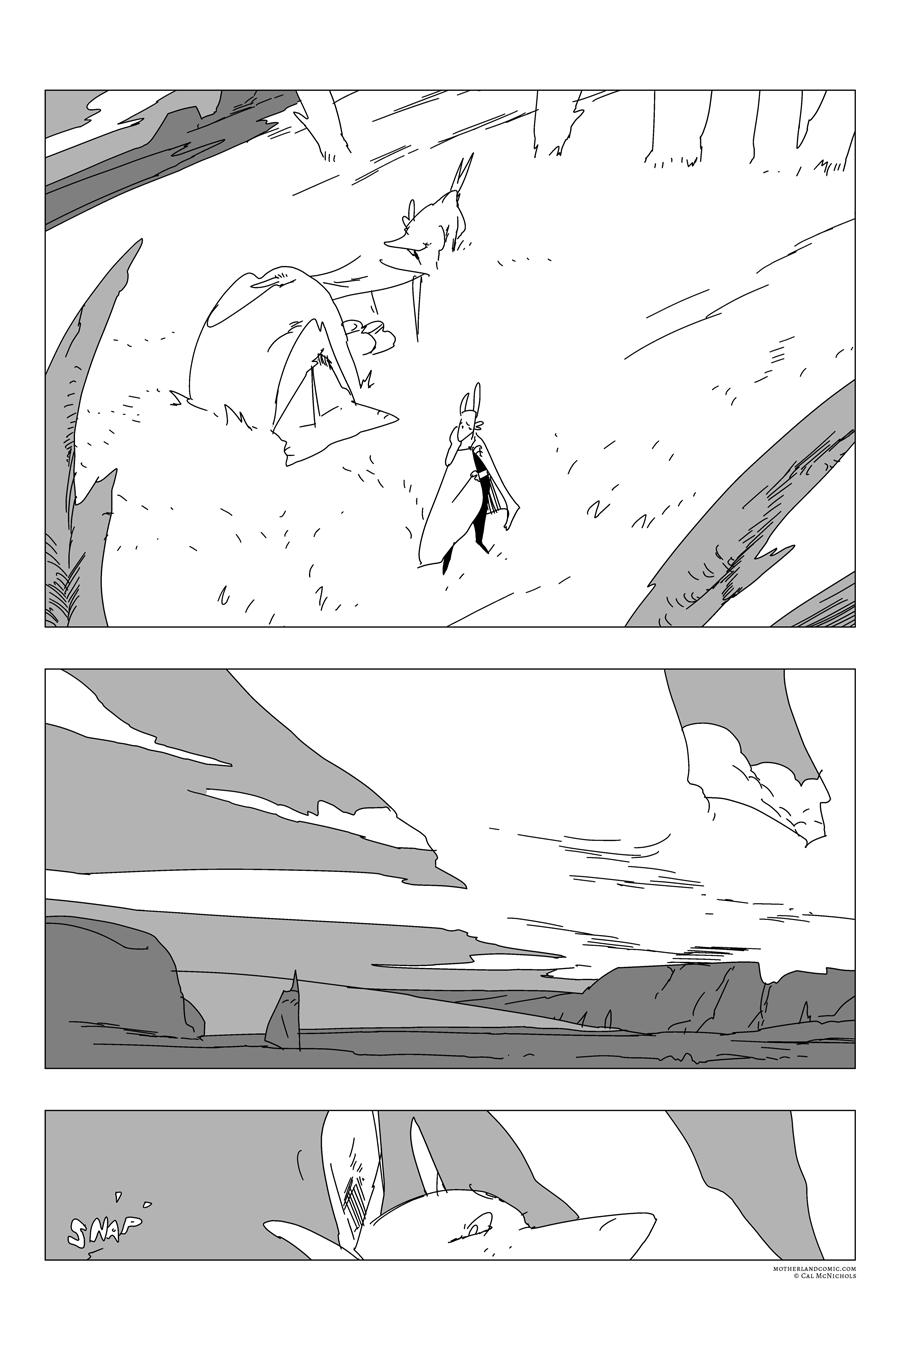 pg 119